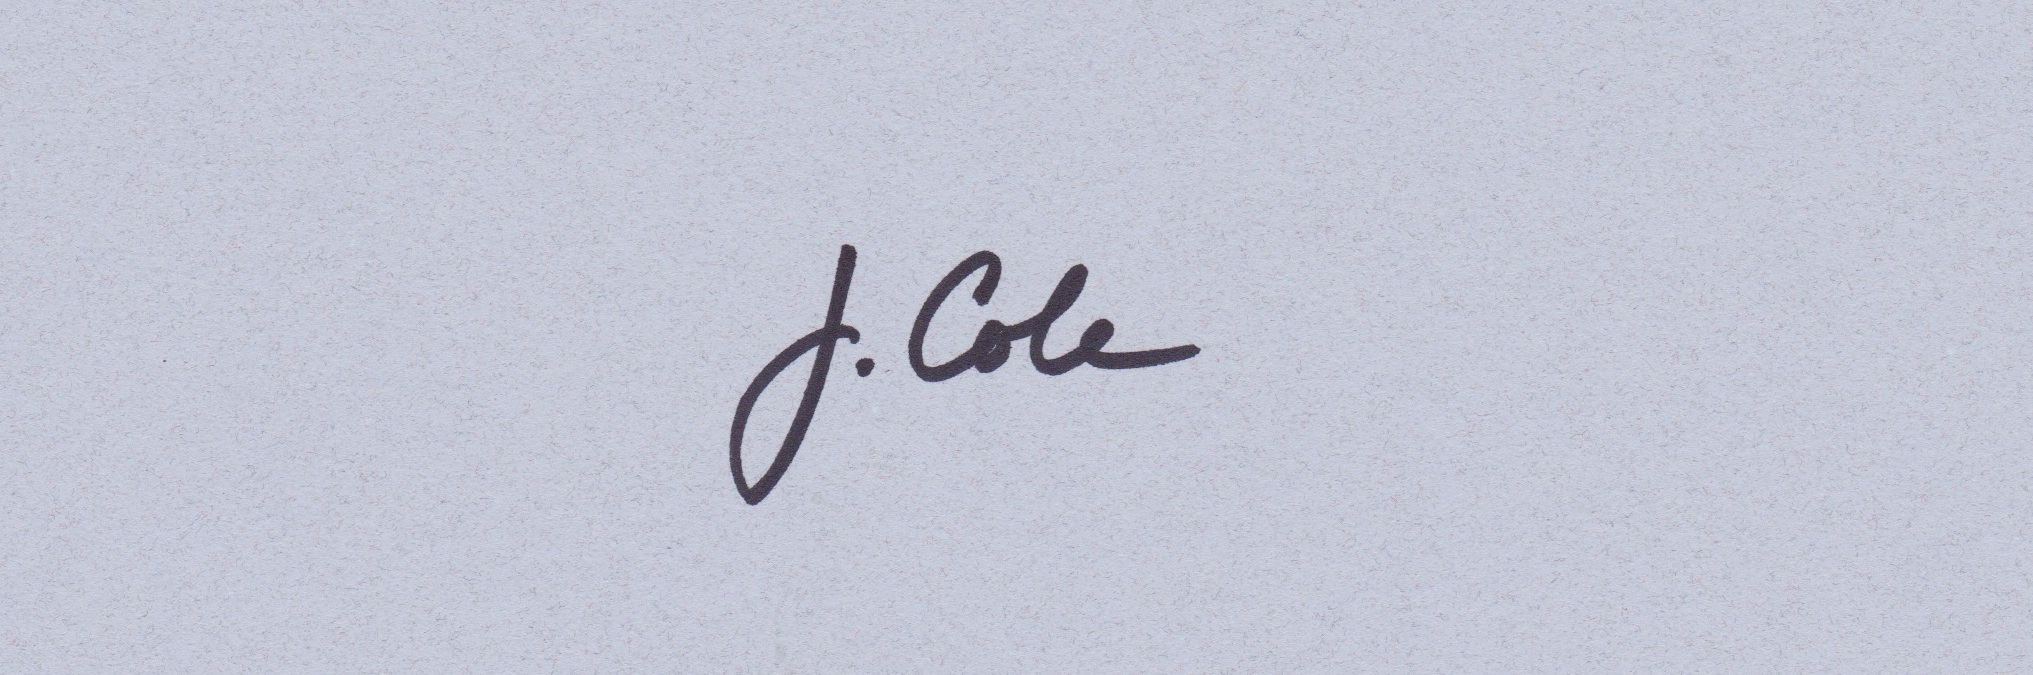 Jennifer Cole's Signature